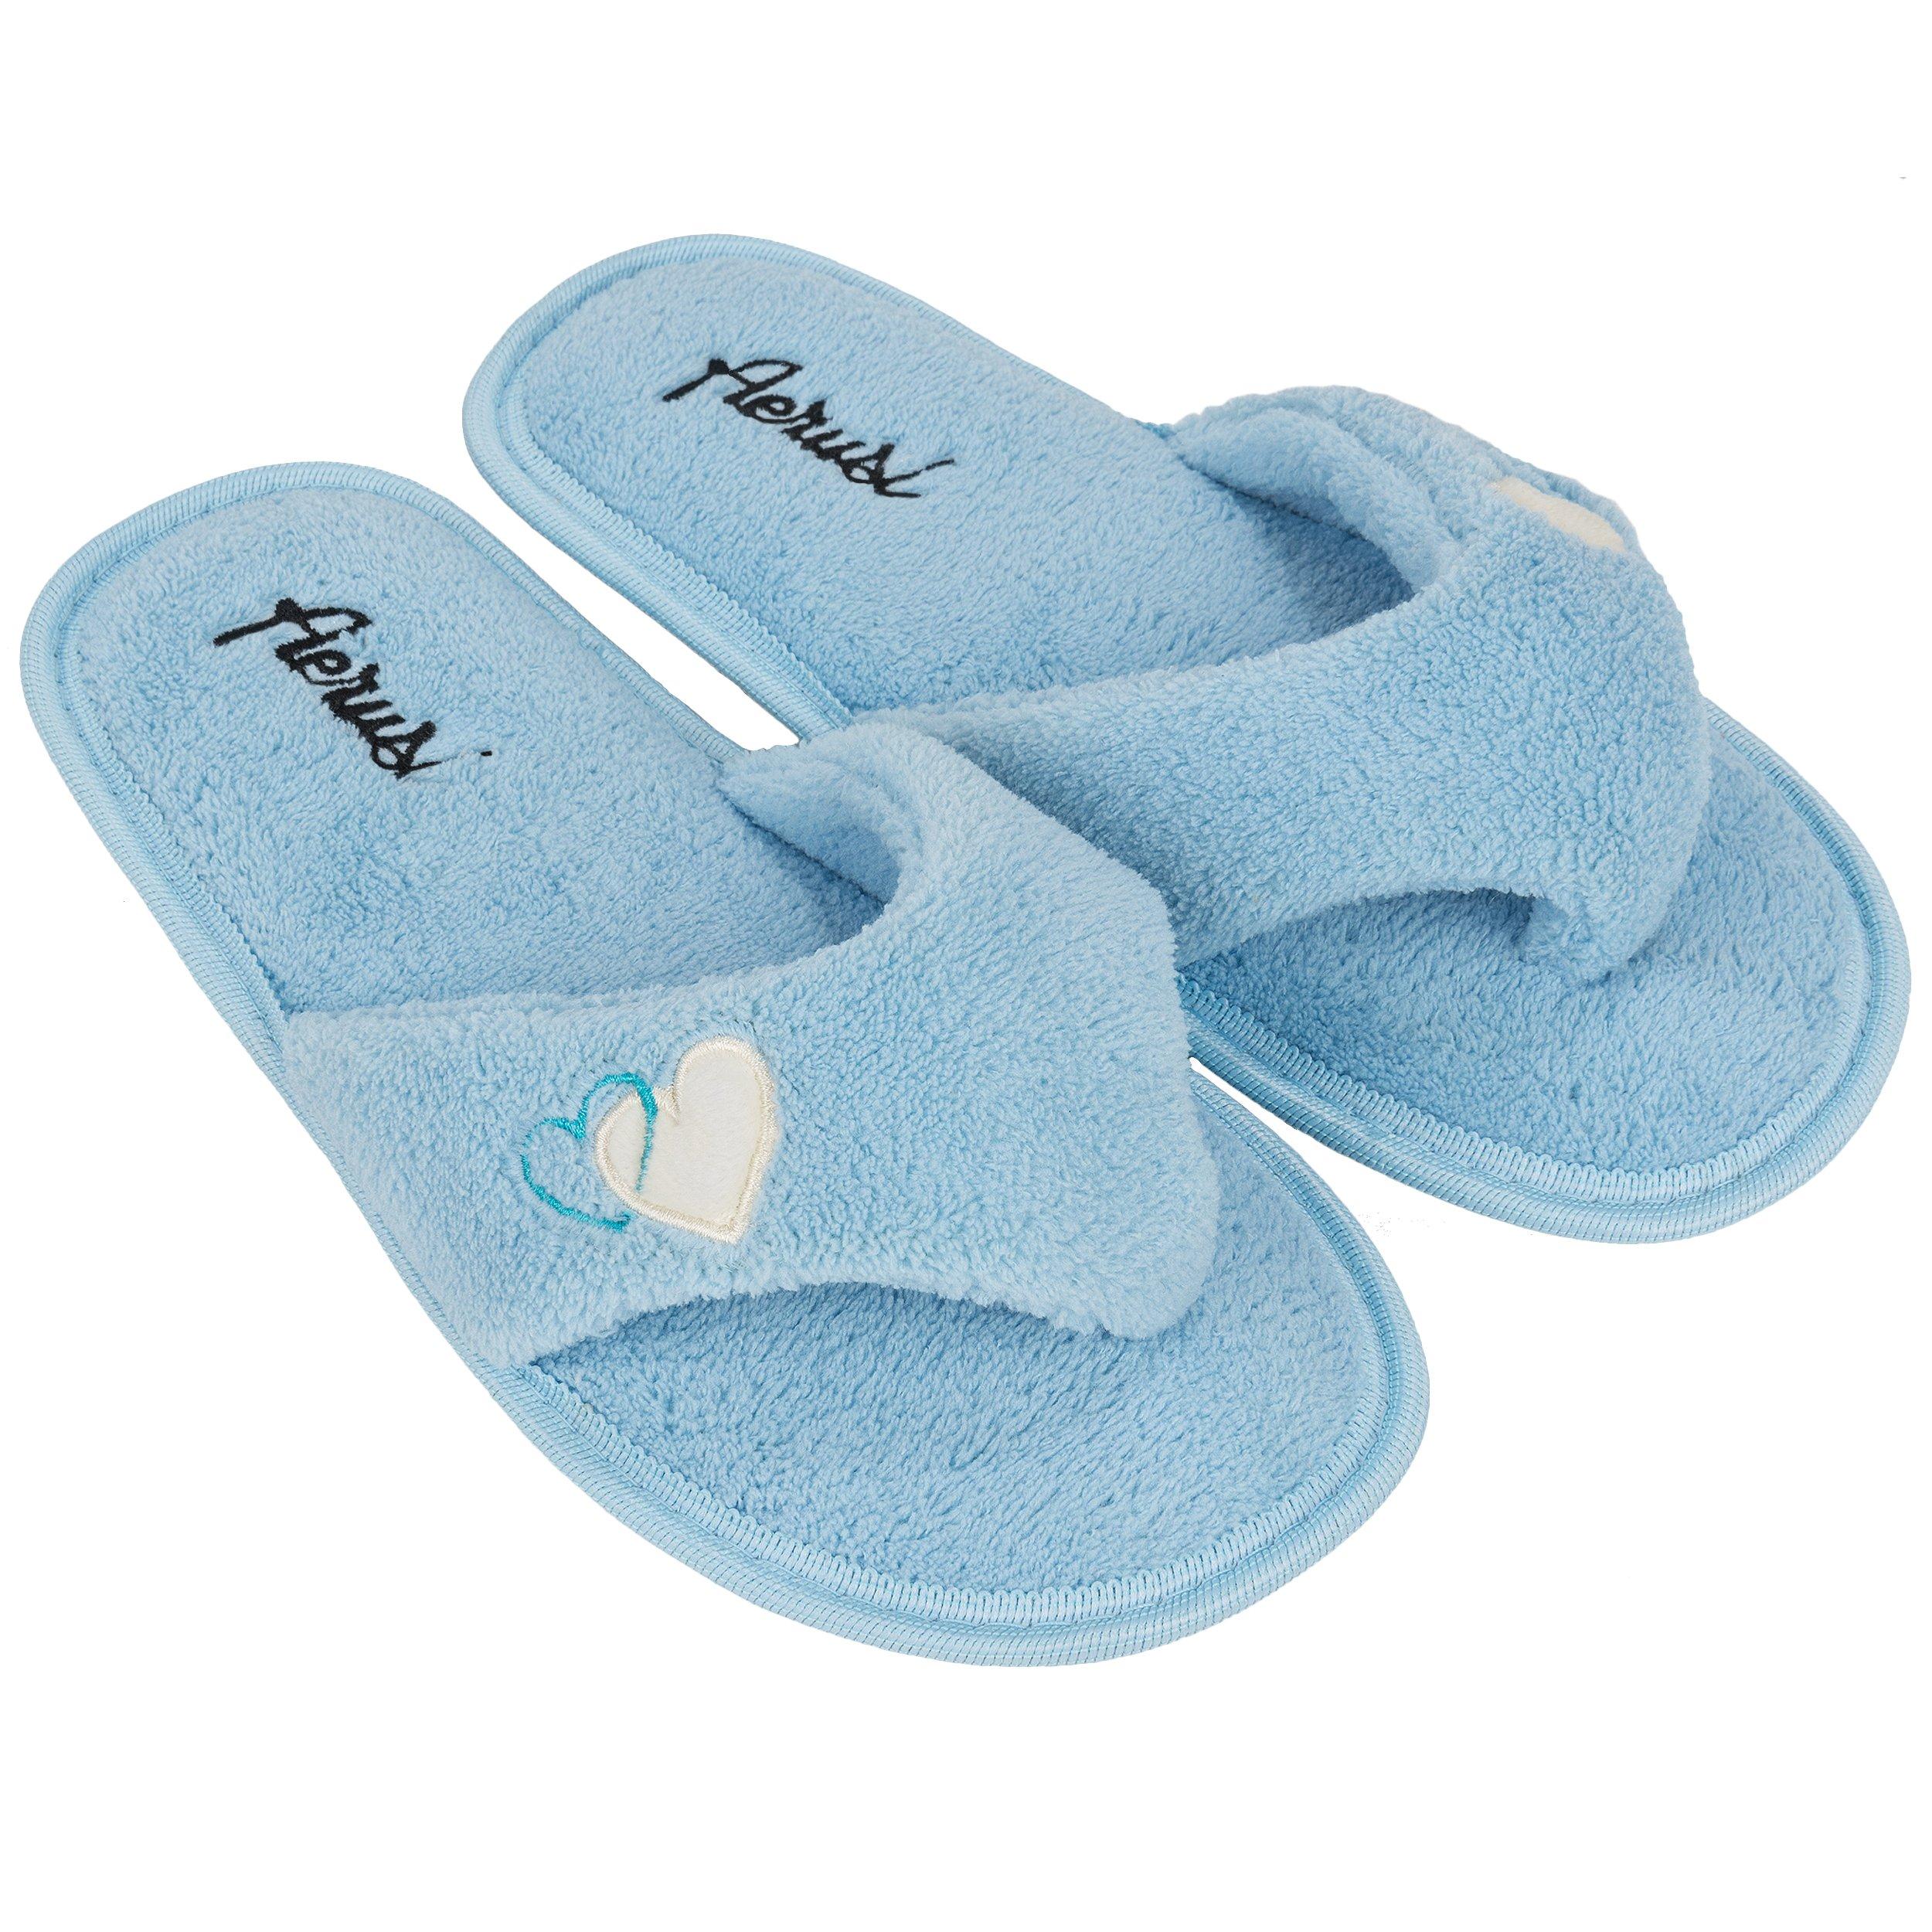 Aerusi Heart Love Women's Splash Spa Bedroom Home Thong Slipper (7 B(M) US, Blue)